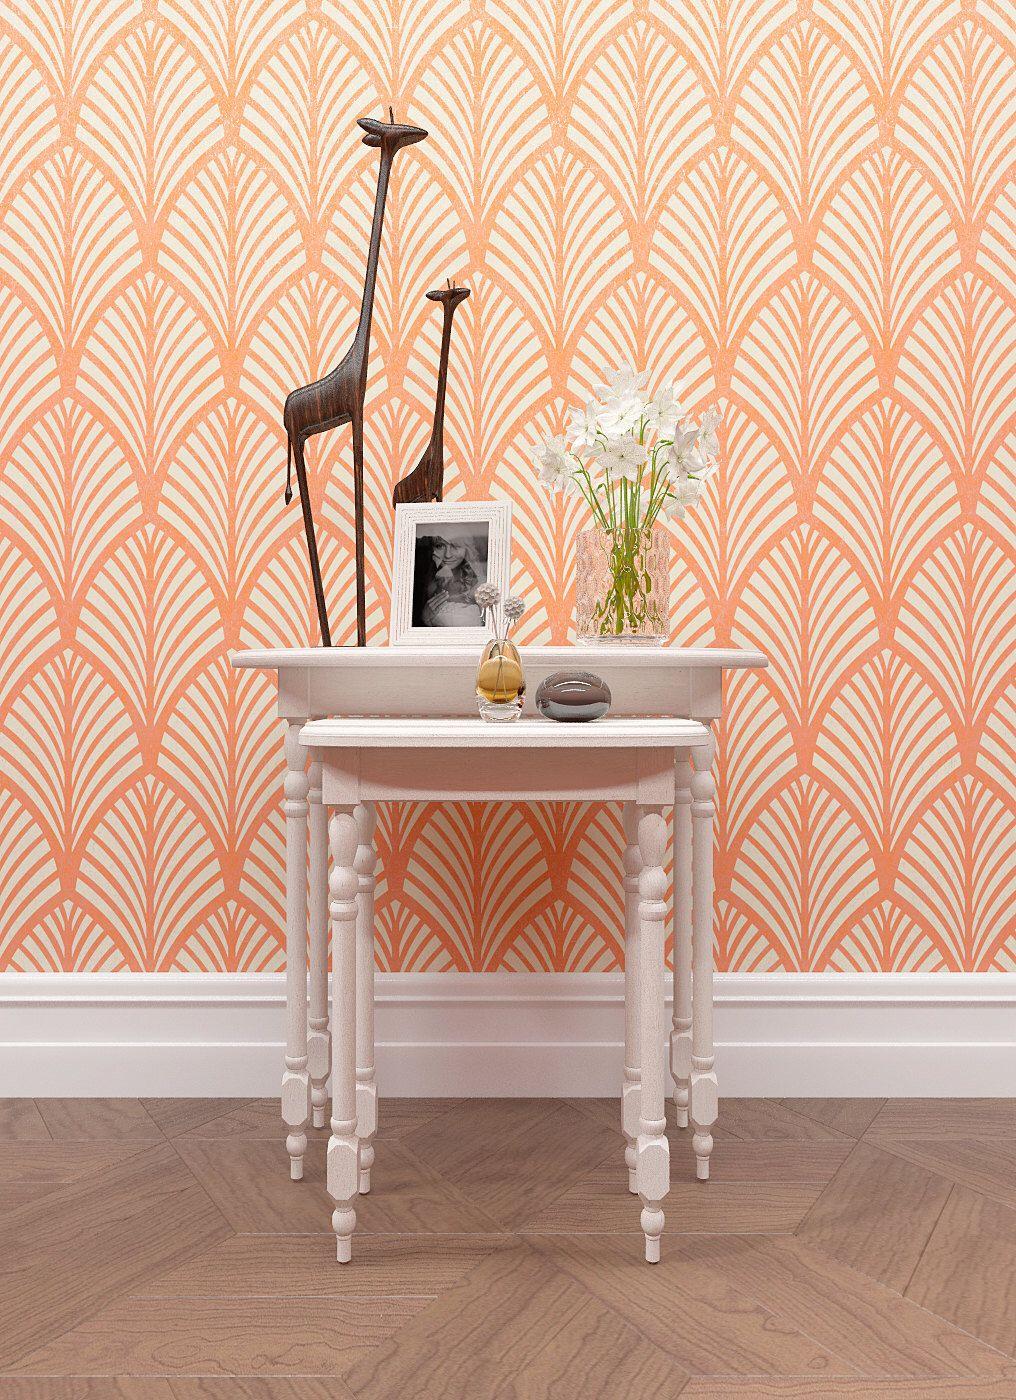 Decorative seamless wall stencil large stencil